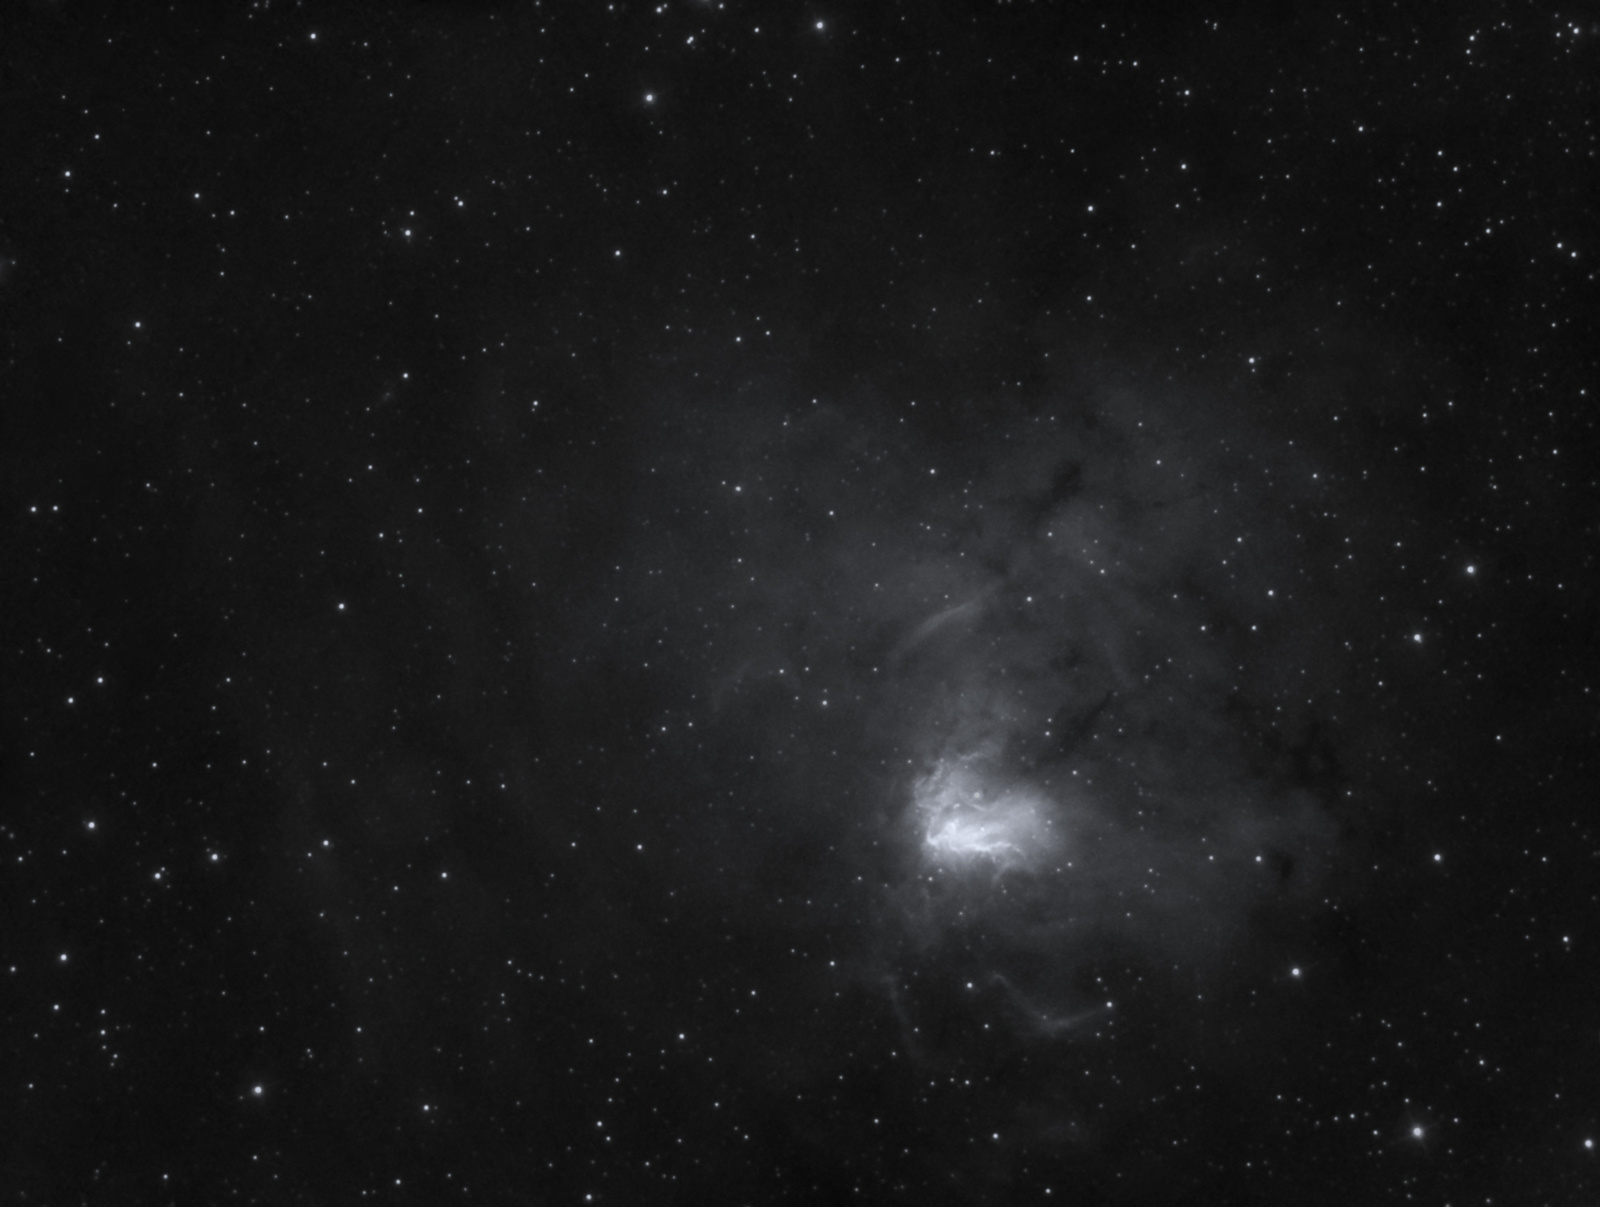 NGC1491_04-09-2018.thumb.jpg.bd1b8b8f1d13dd1126e55efff08f3adb.jpg